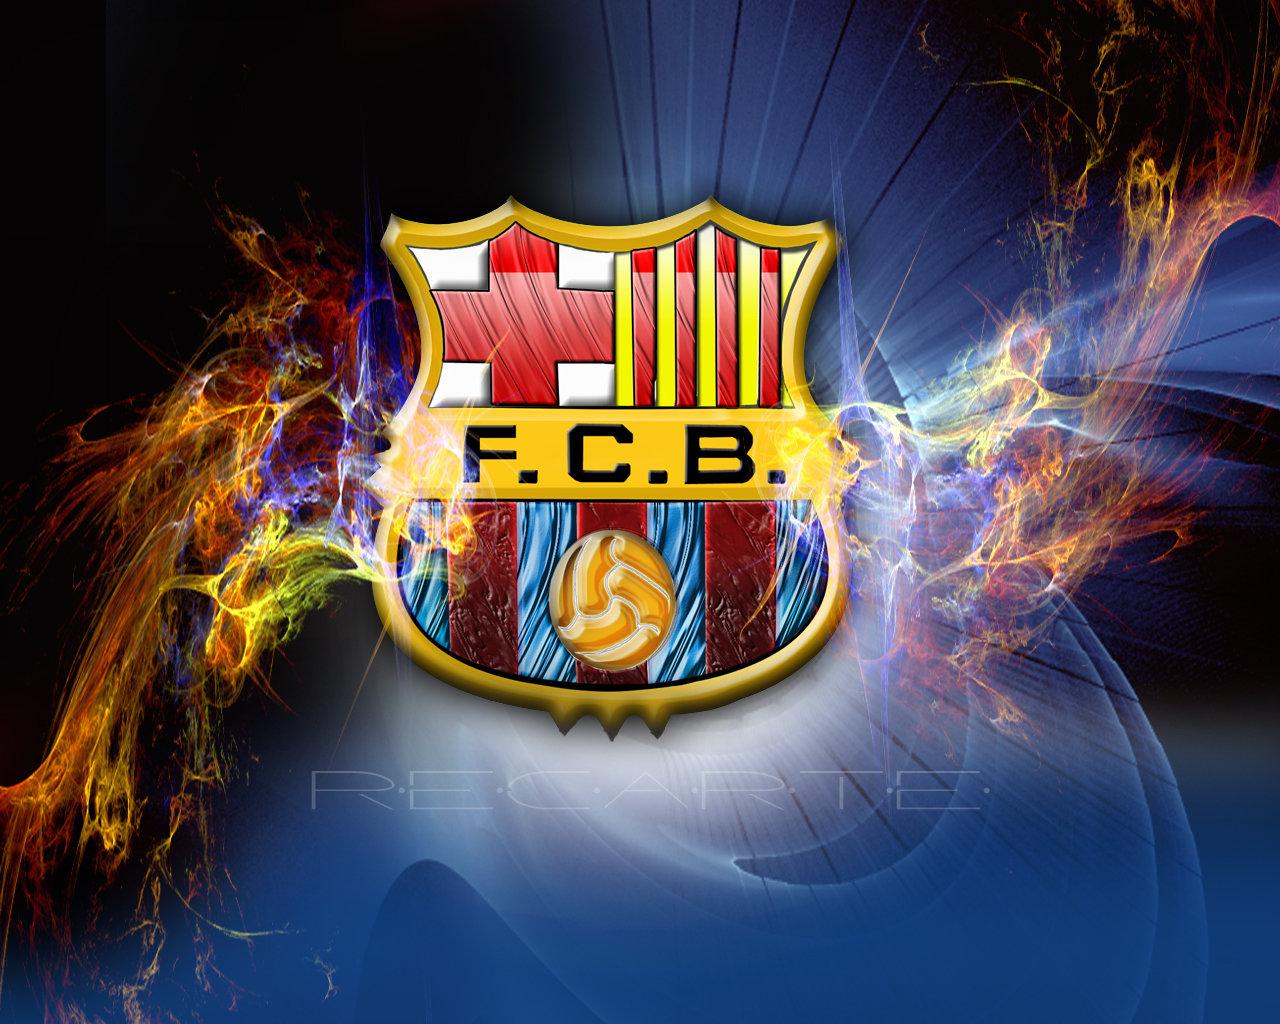 Profil Biodata Barcelona FC Terbaru 2013 2014 Bola Penting 1280x1024